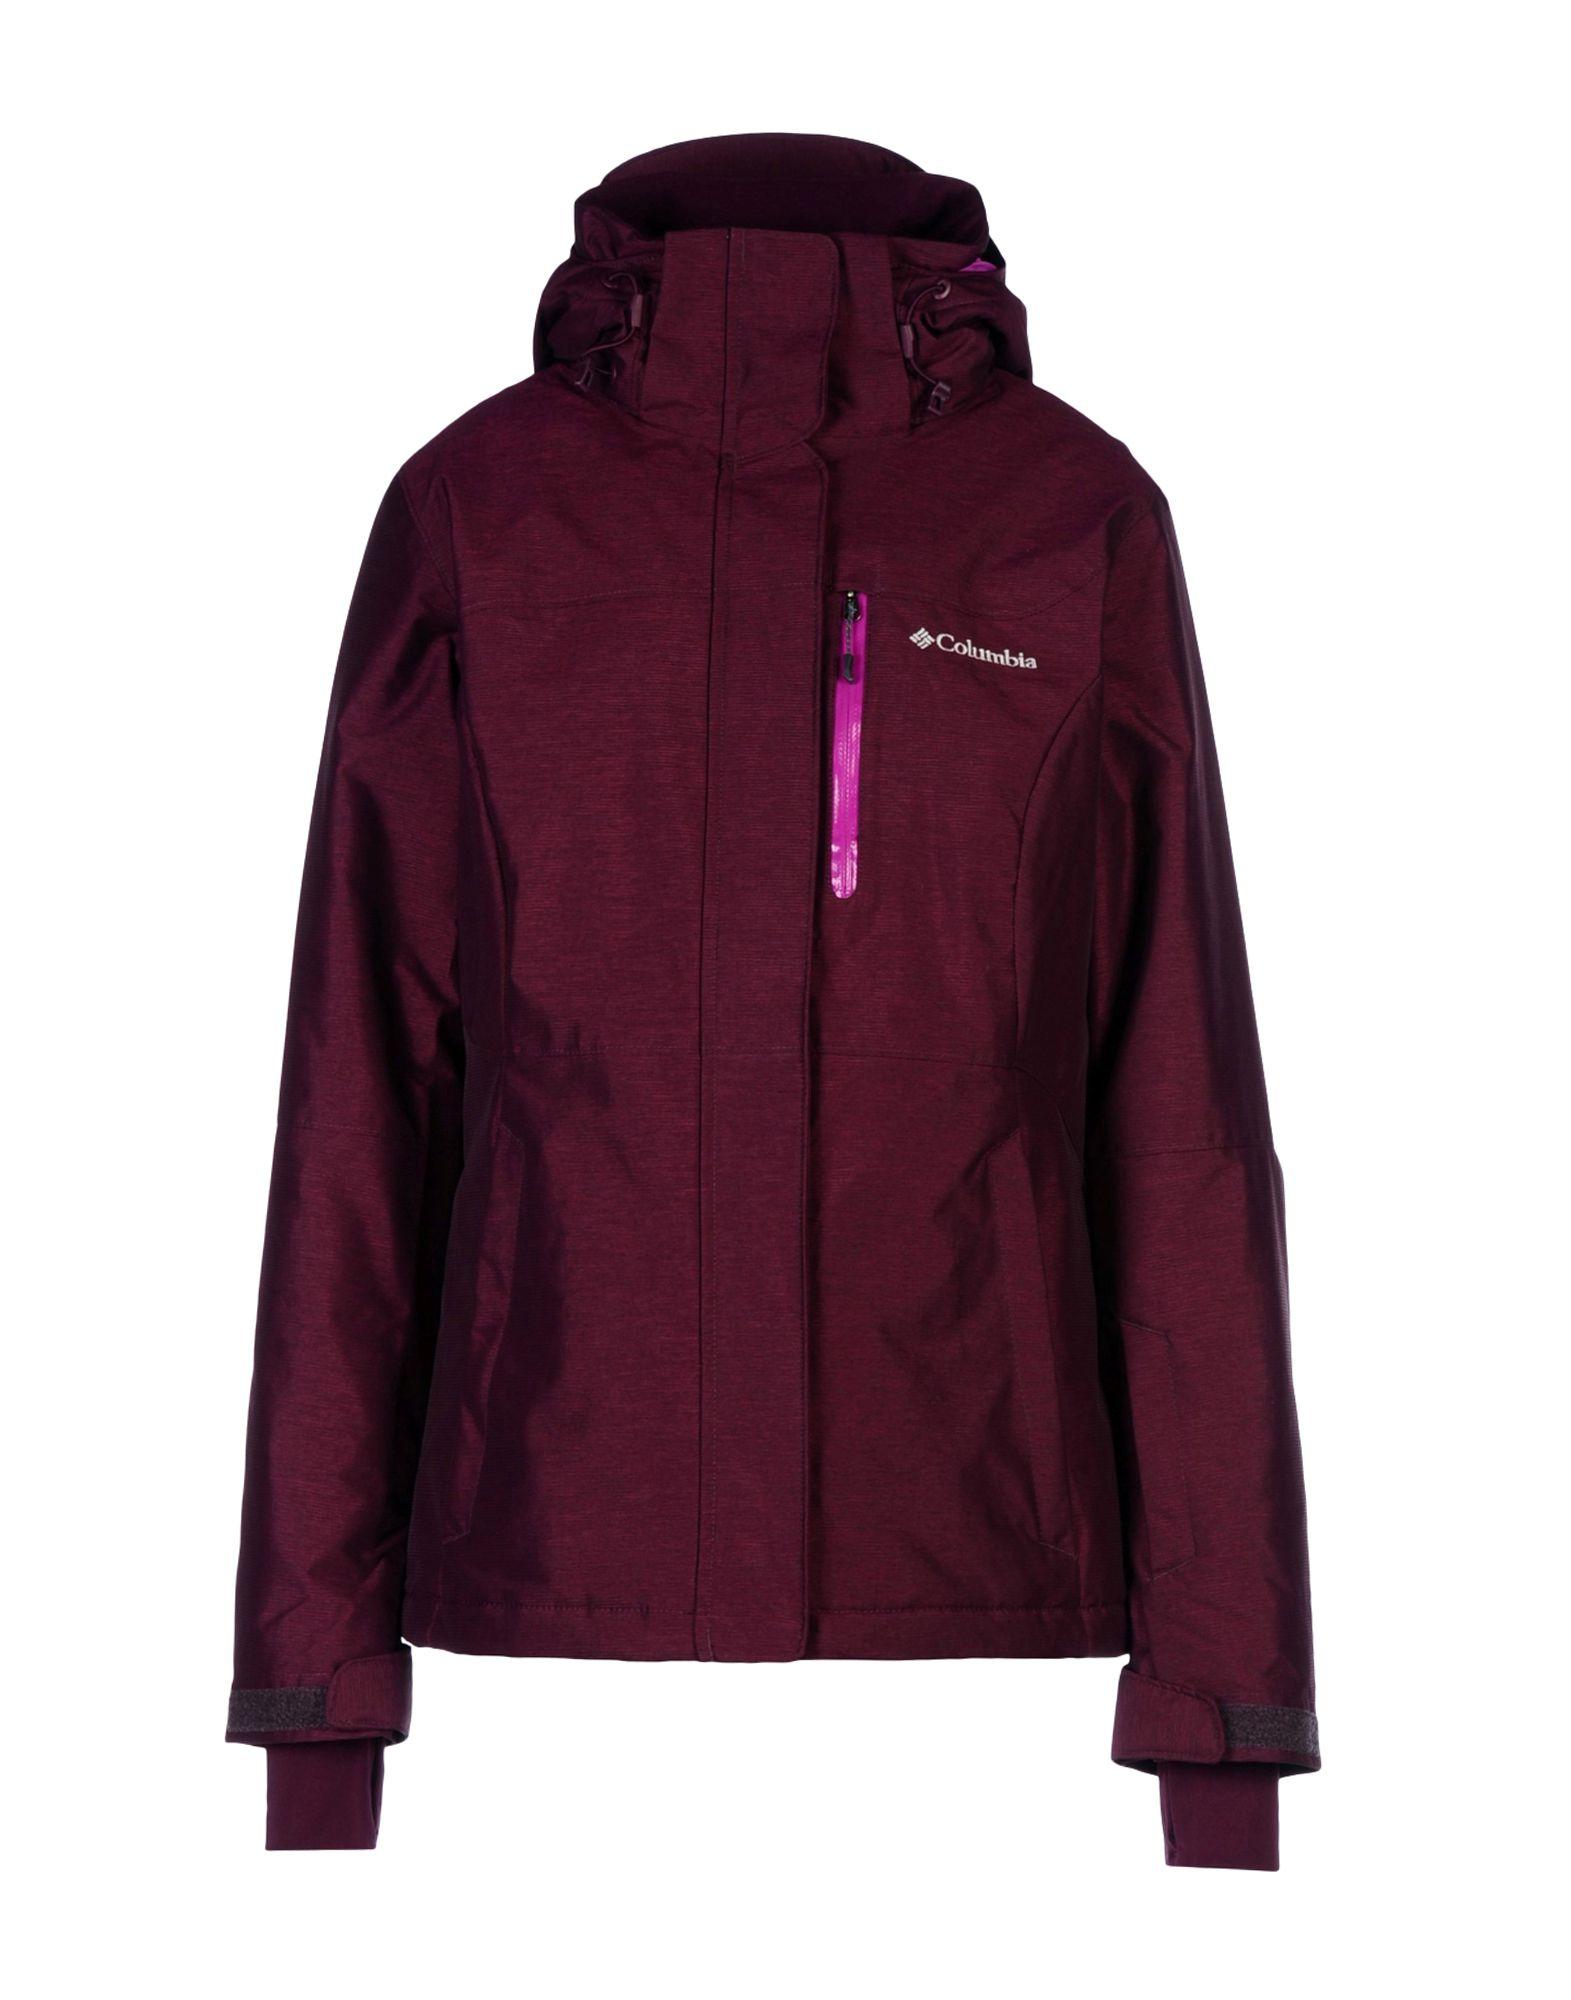 6f92dd8d5f0 Columbia Alpine Action™ Oh Jacket Jacket Women Columbia Jackets 41602530CB